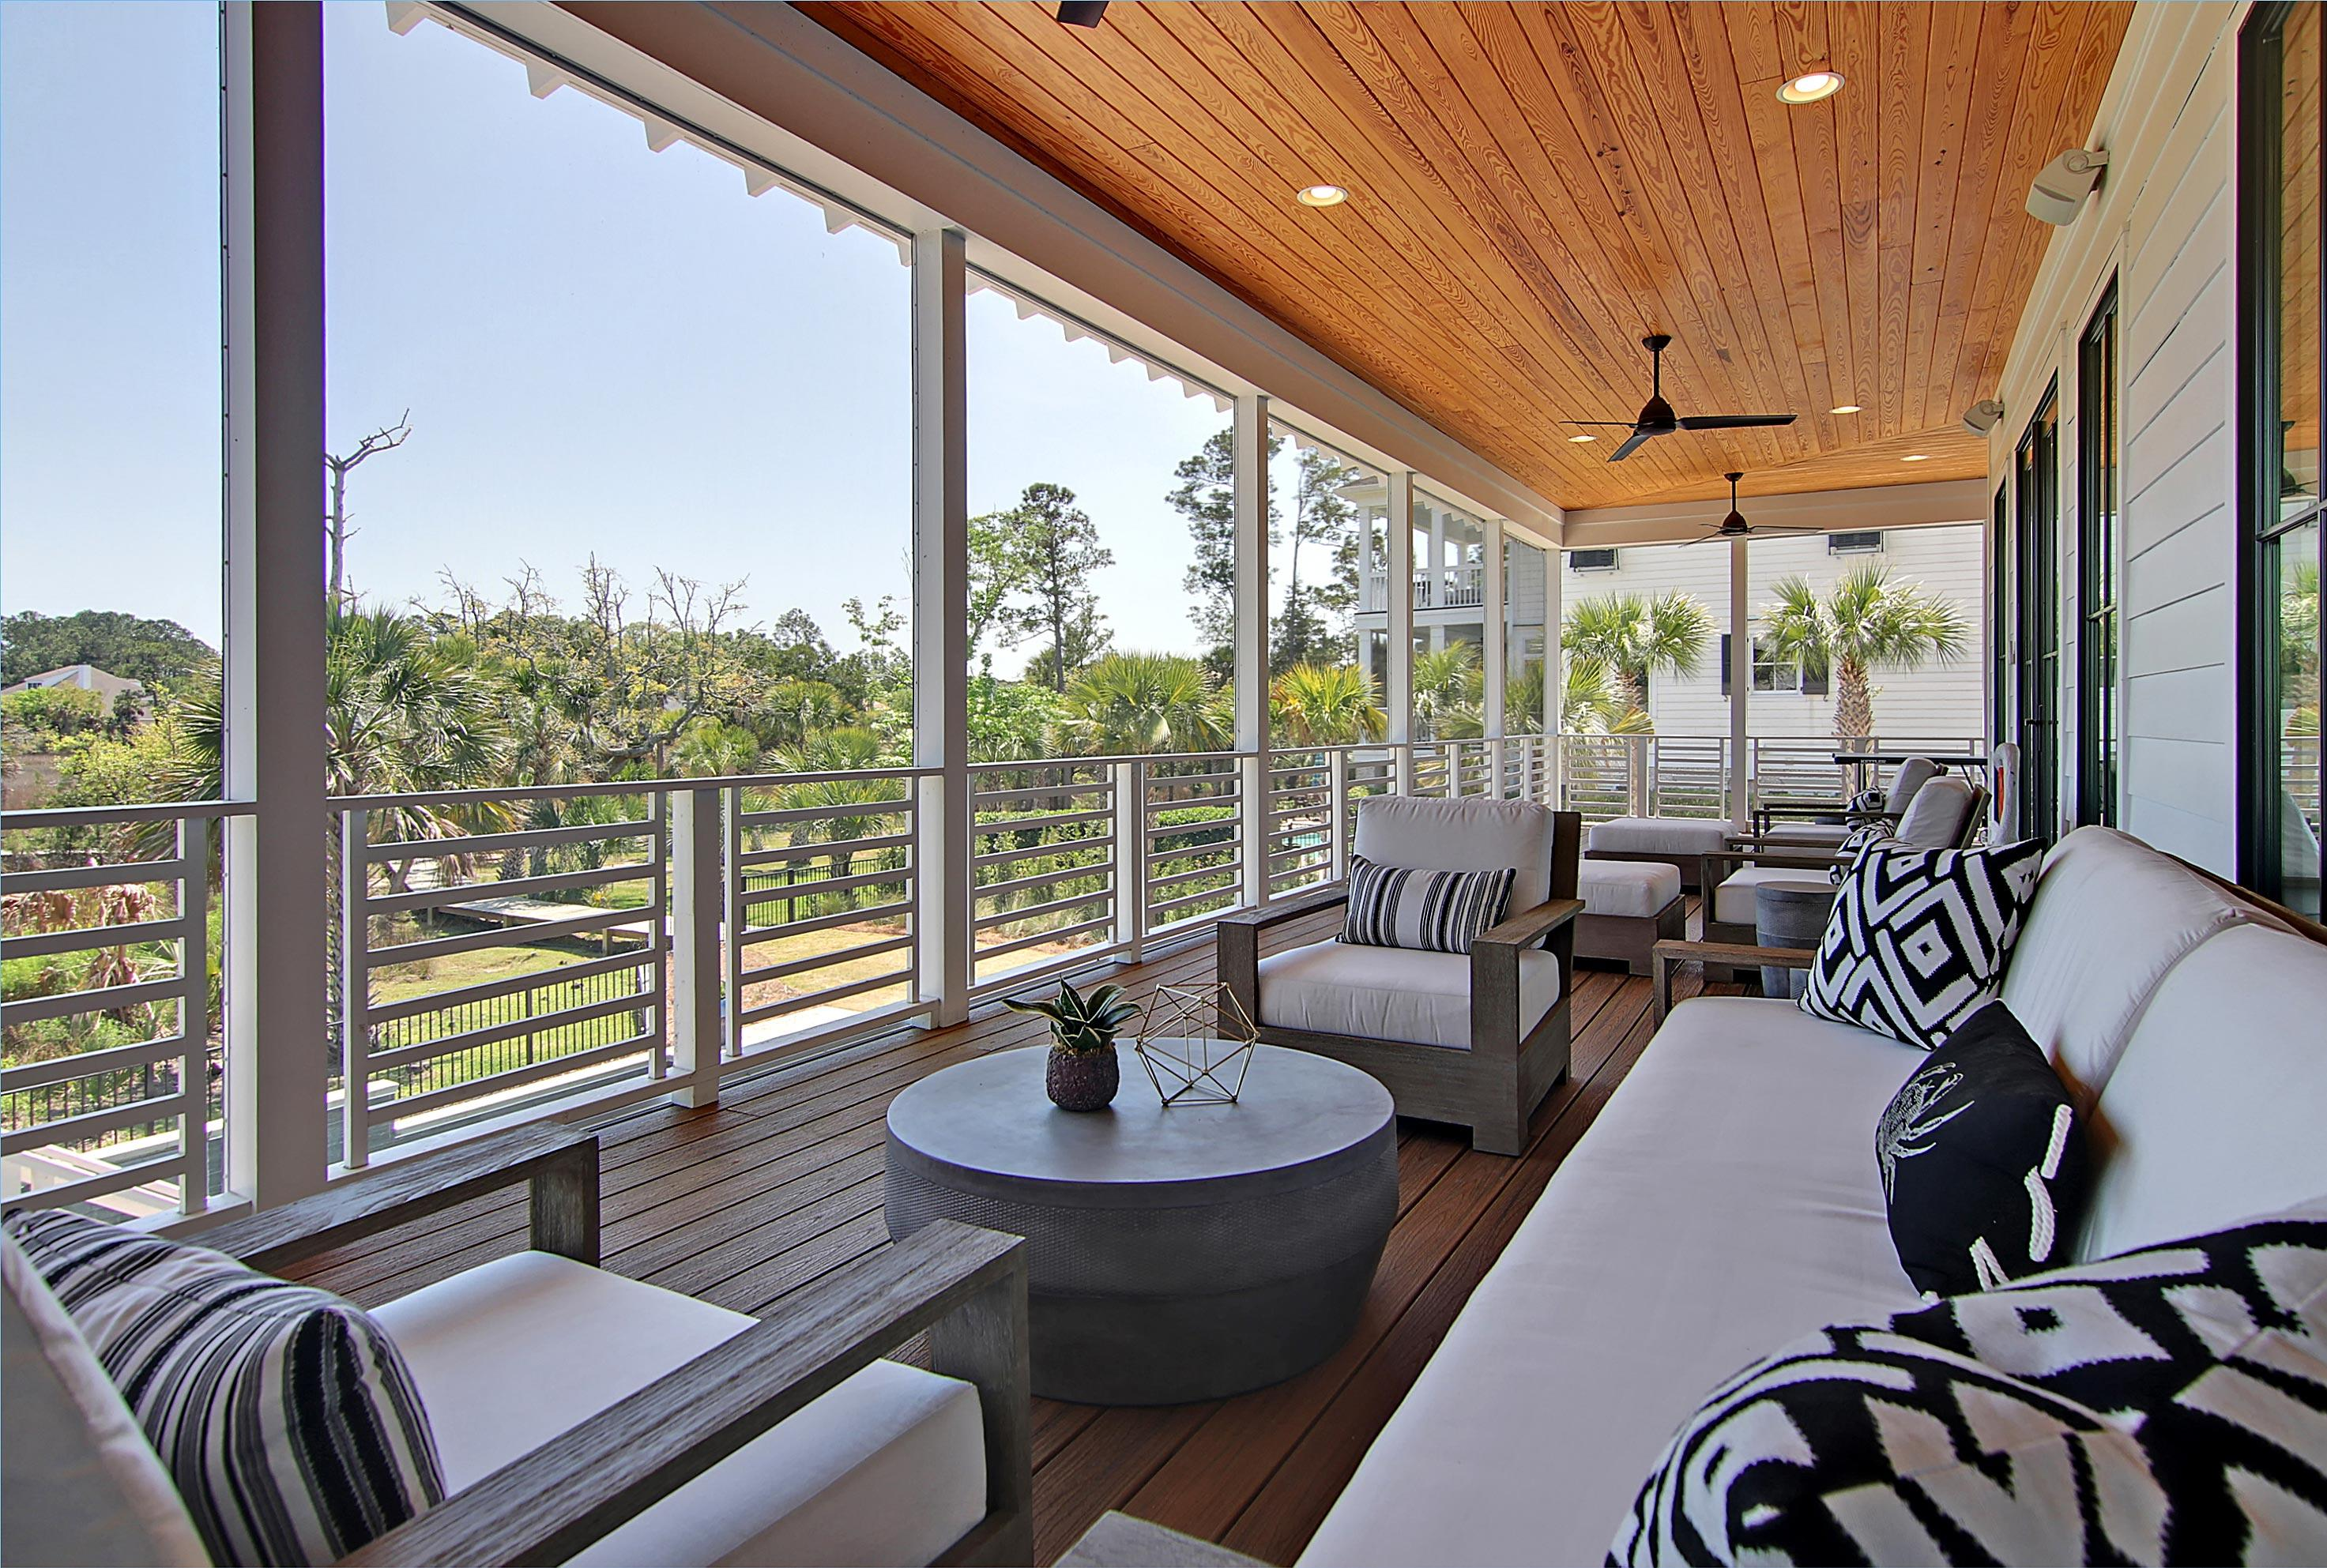 Dunes West Homes For Sale - 2456 Darts Cove, Mount Pleasant, SC - 36